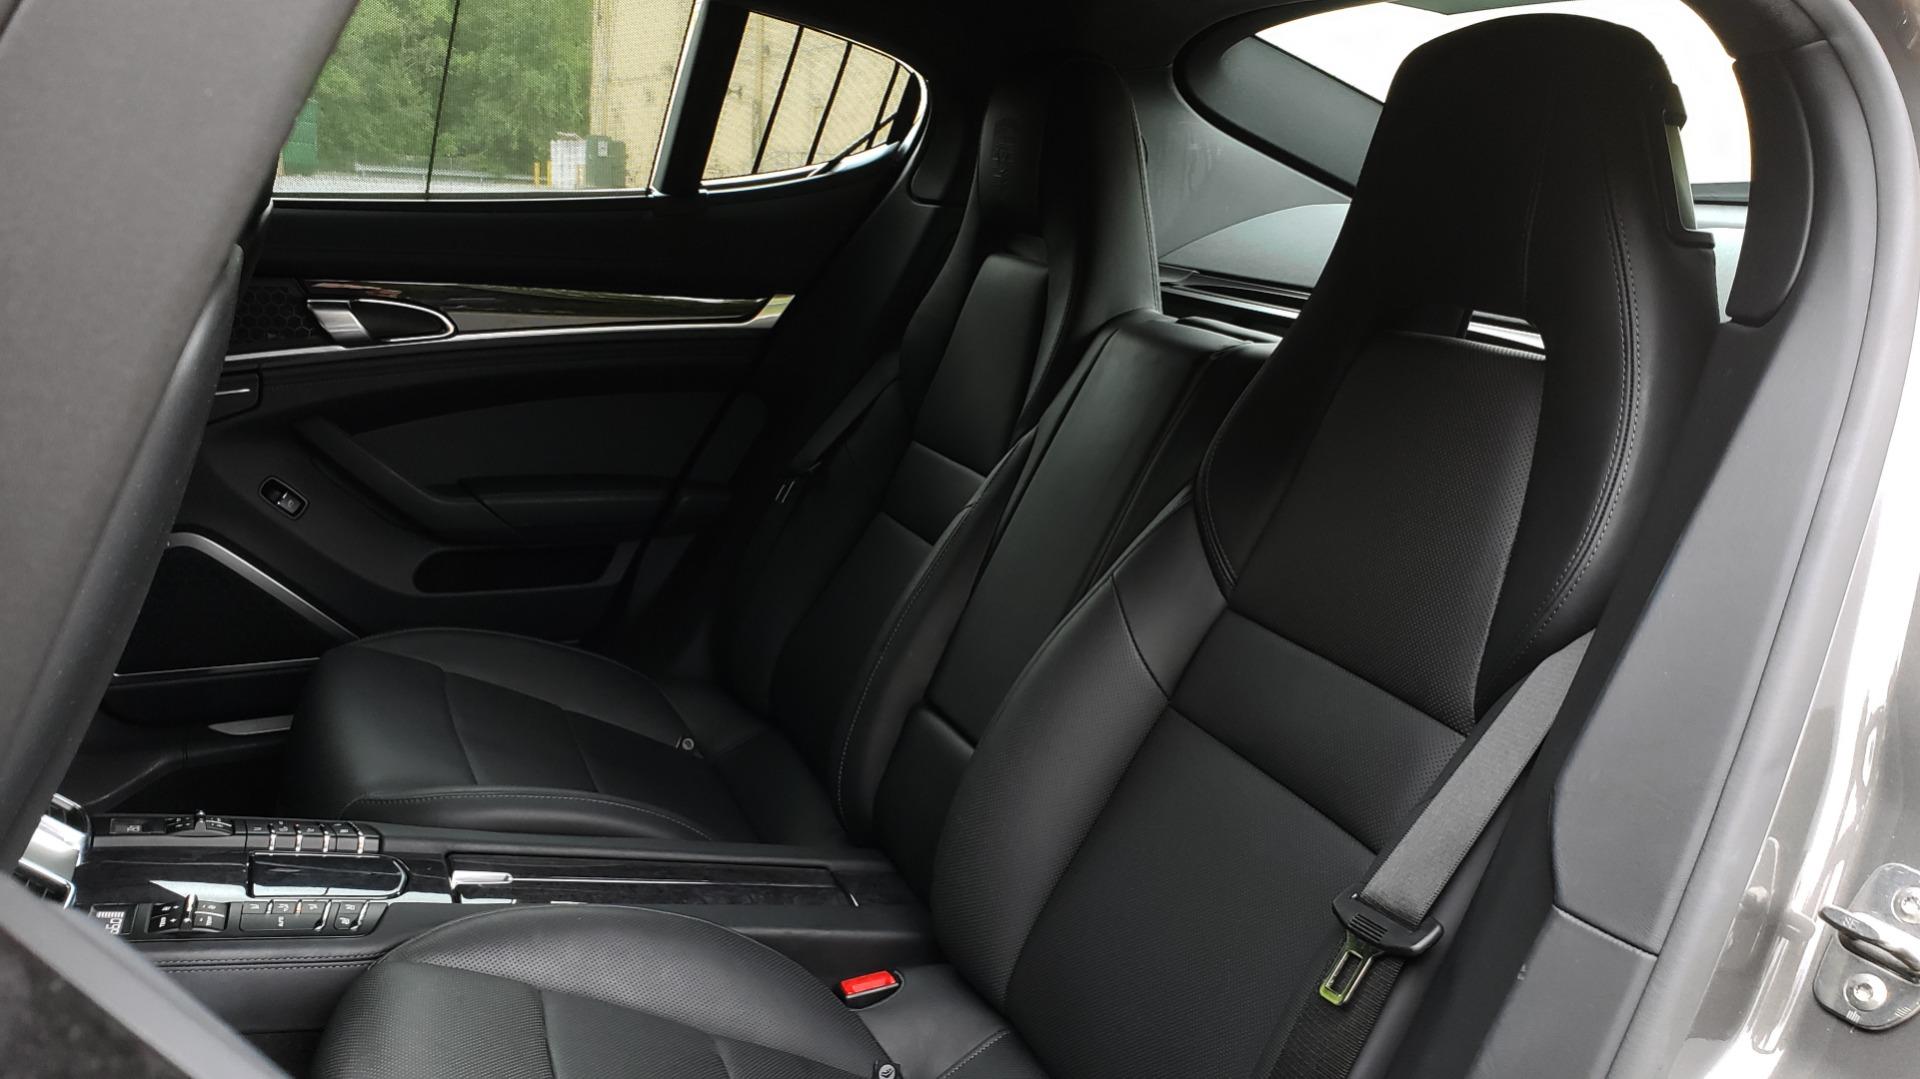 Used 2013 Porsche PANAMERA TURBO 4.8L V8 / AWD / NAV / SUNROOF / LCA / PARK ASST / BURMESTER for sale $45,995 at Formula Imports in Charlotte NC 28227 65